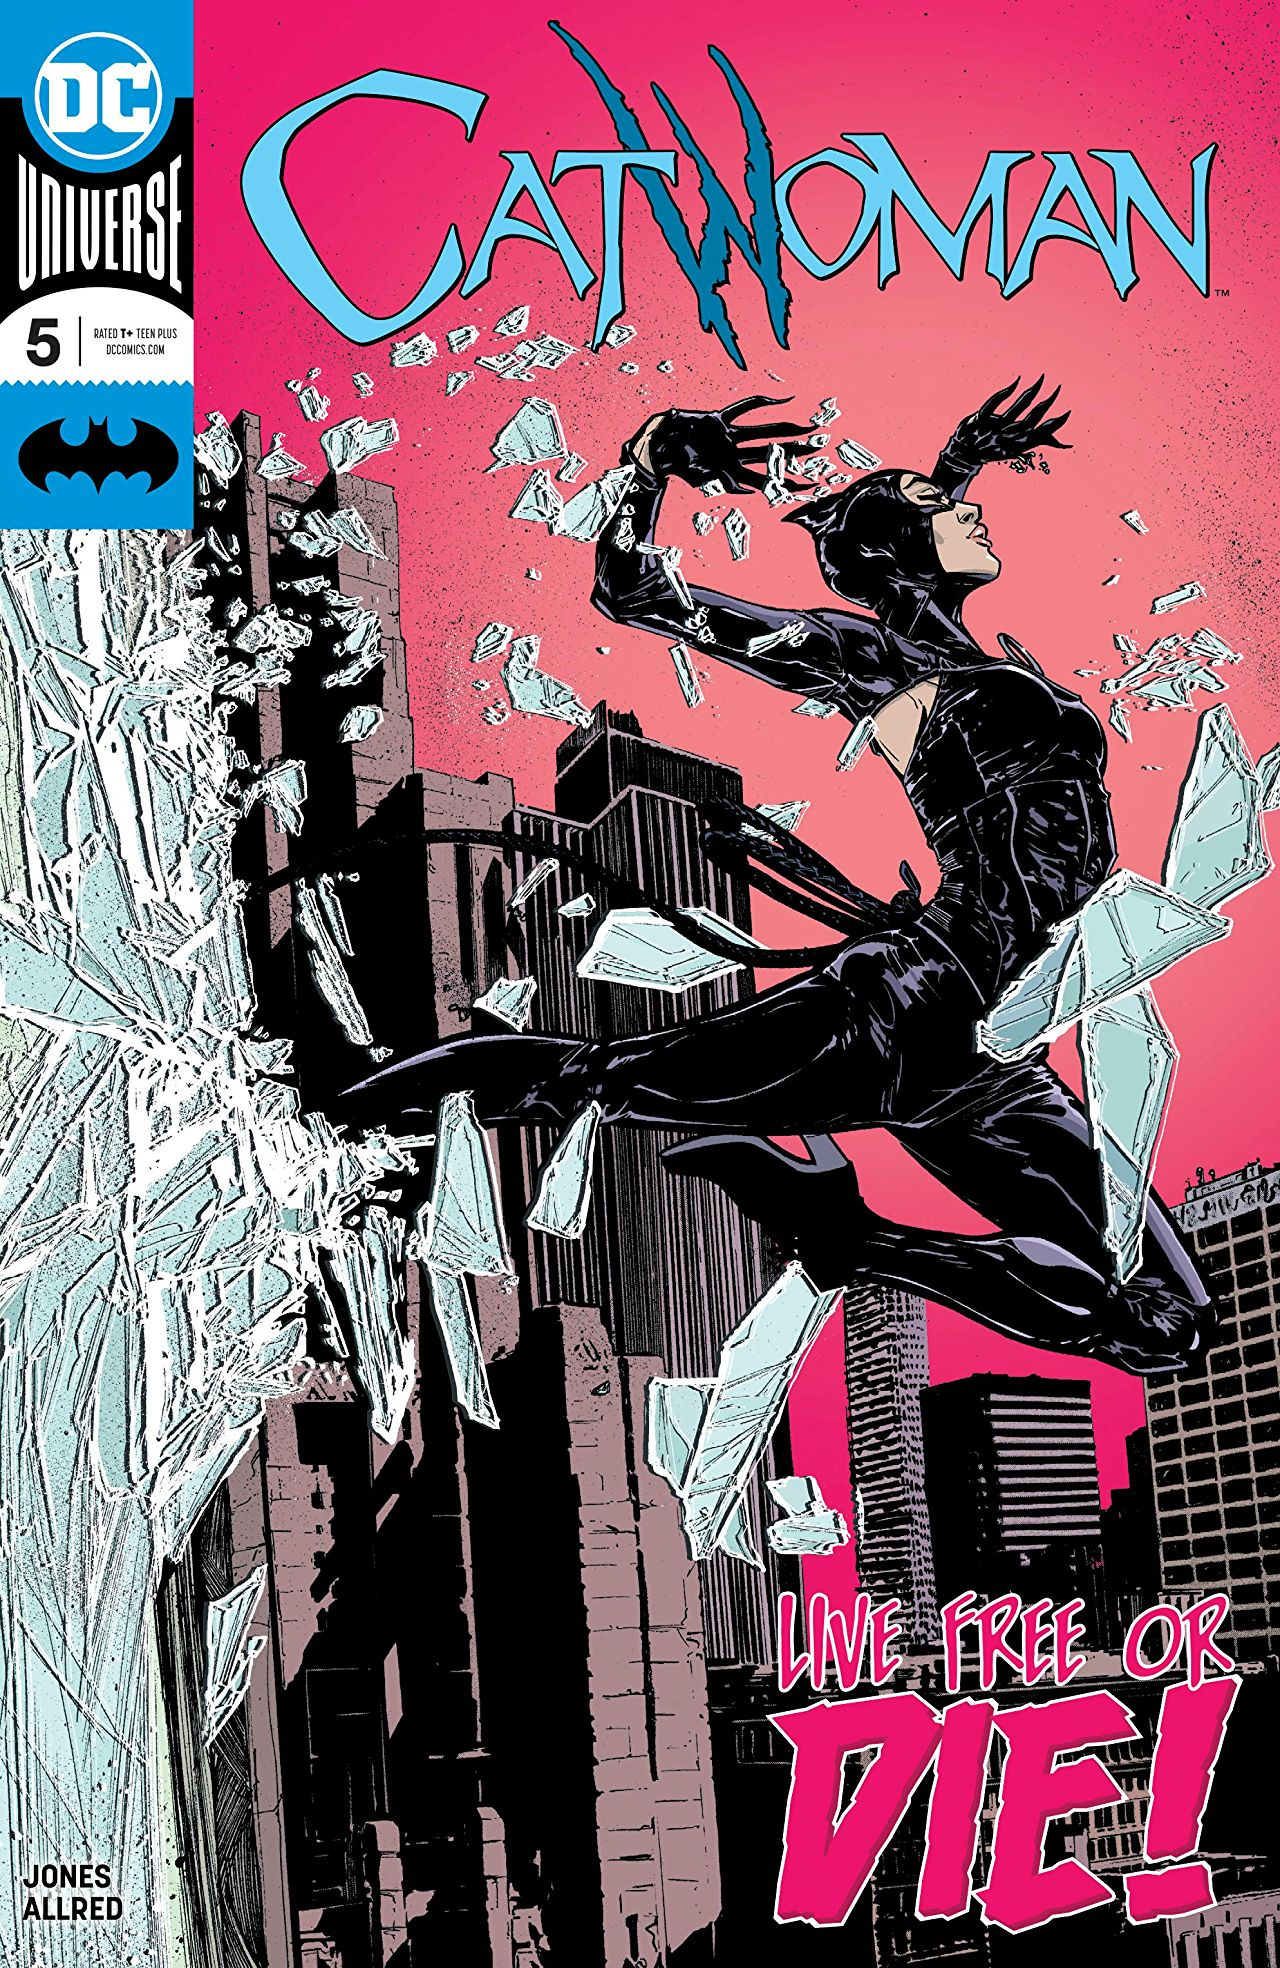 Catwoman5.jpg